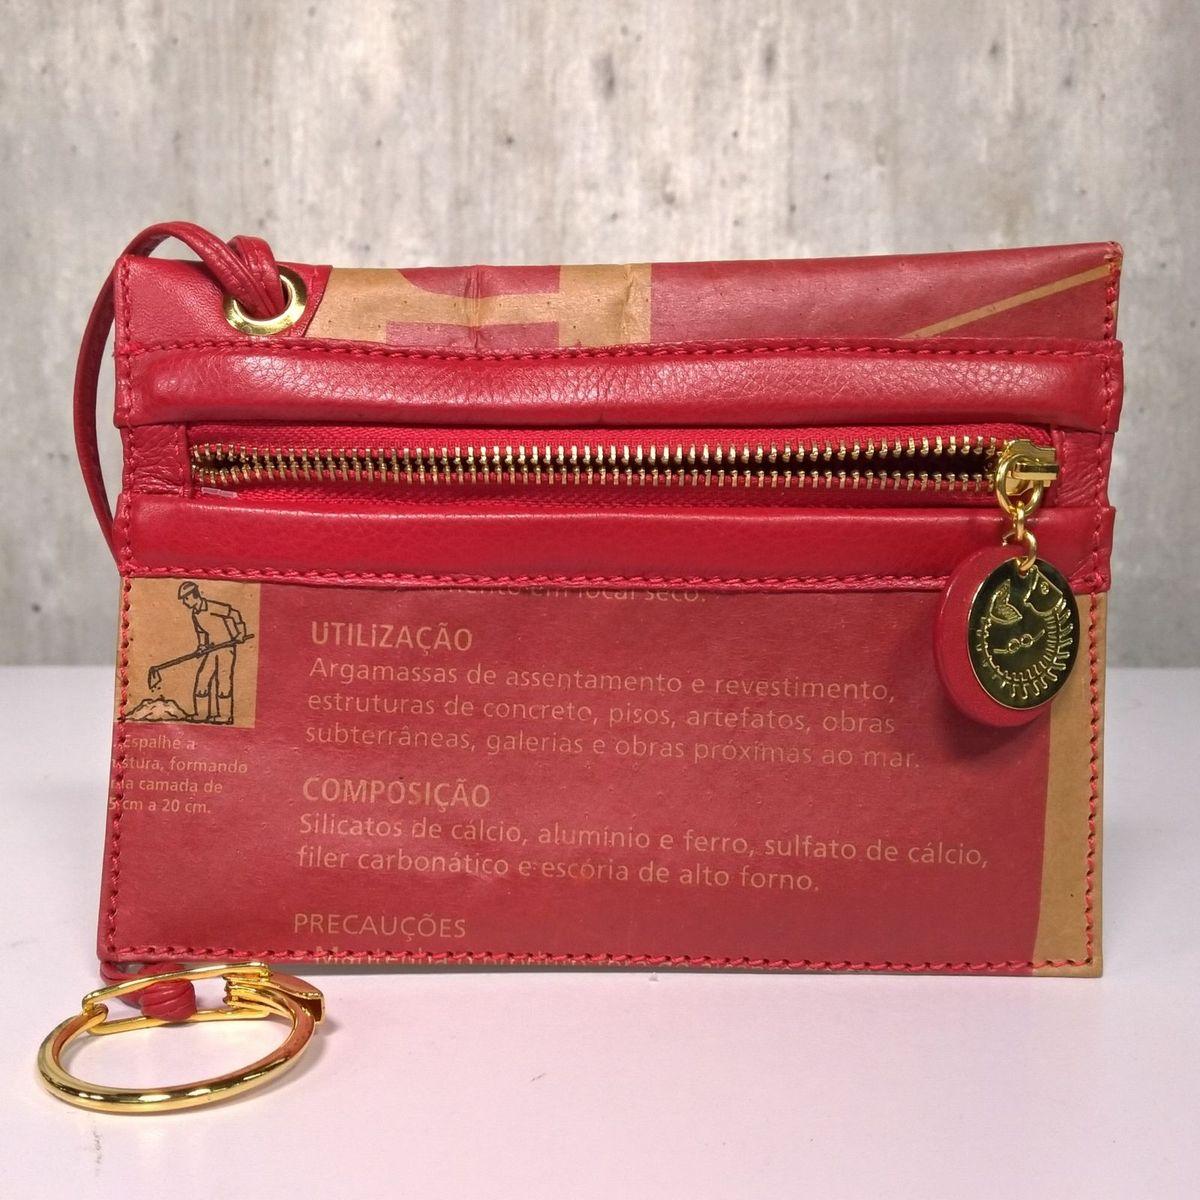 38d023356 carteira de papelão vermelha - carteiras caue.  Czm6ly9wag90b3muzw5qb2vplmnvbs5ici9wcm9kdwn0cy83mzk0mtqxlze5ntnmywnjymq4njdlnzjlmtfizwq4zdniotaxnzazlmpwzw  ...